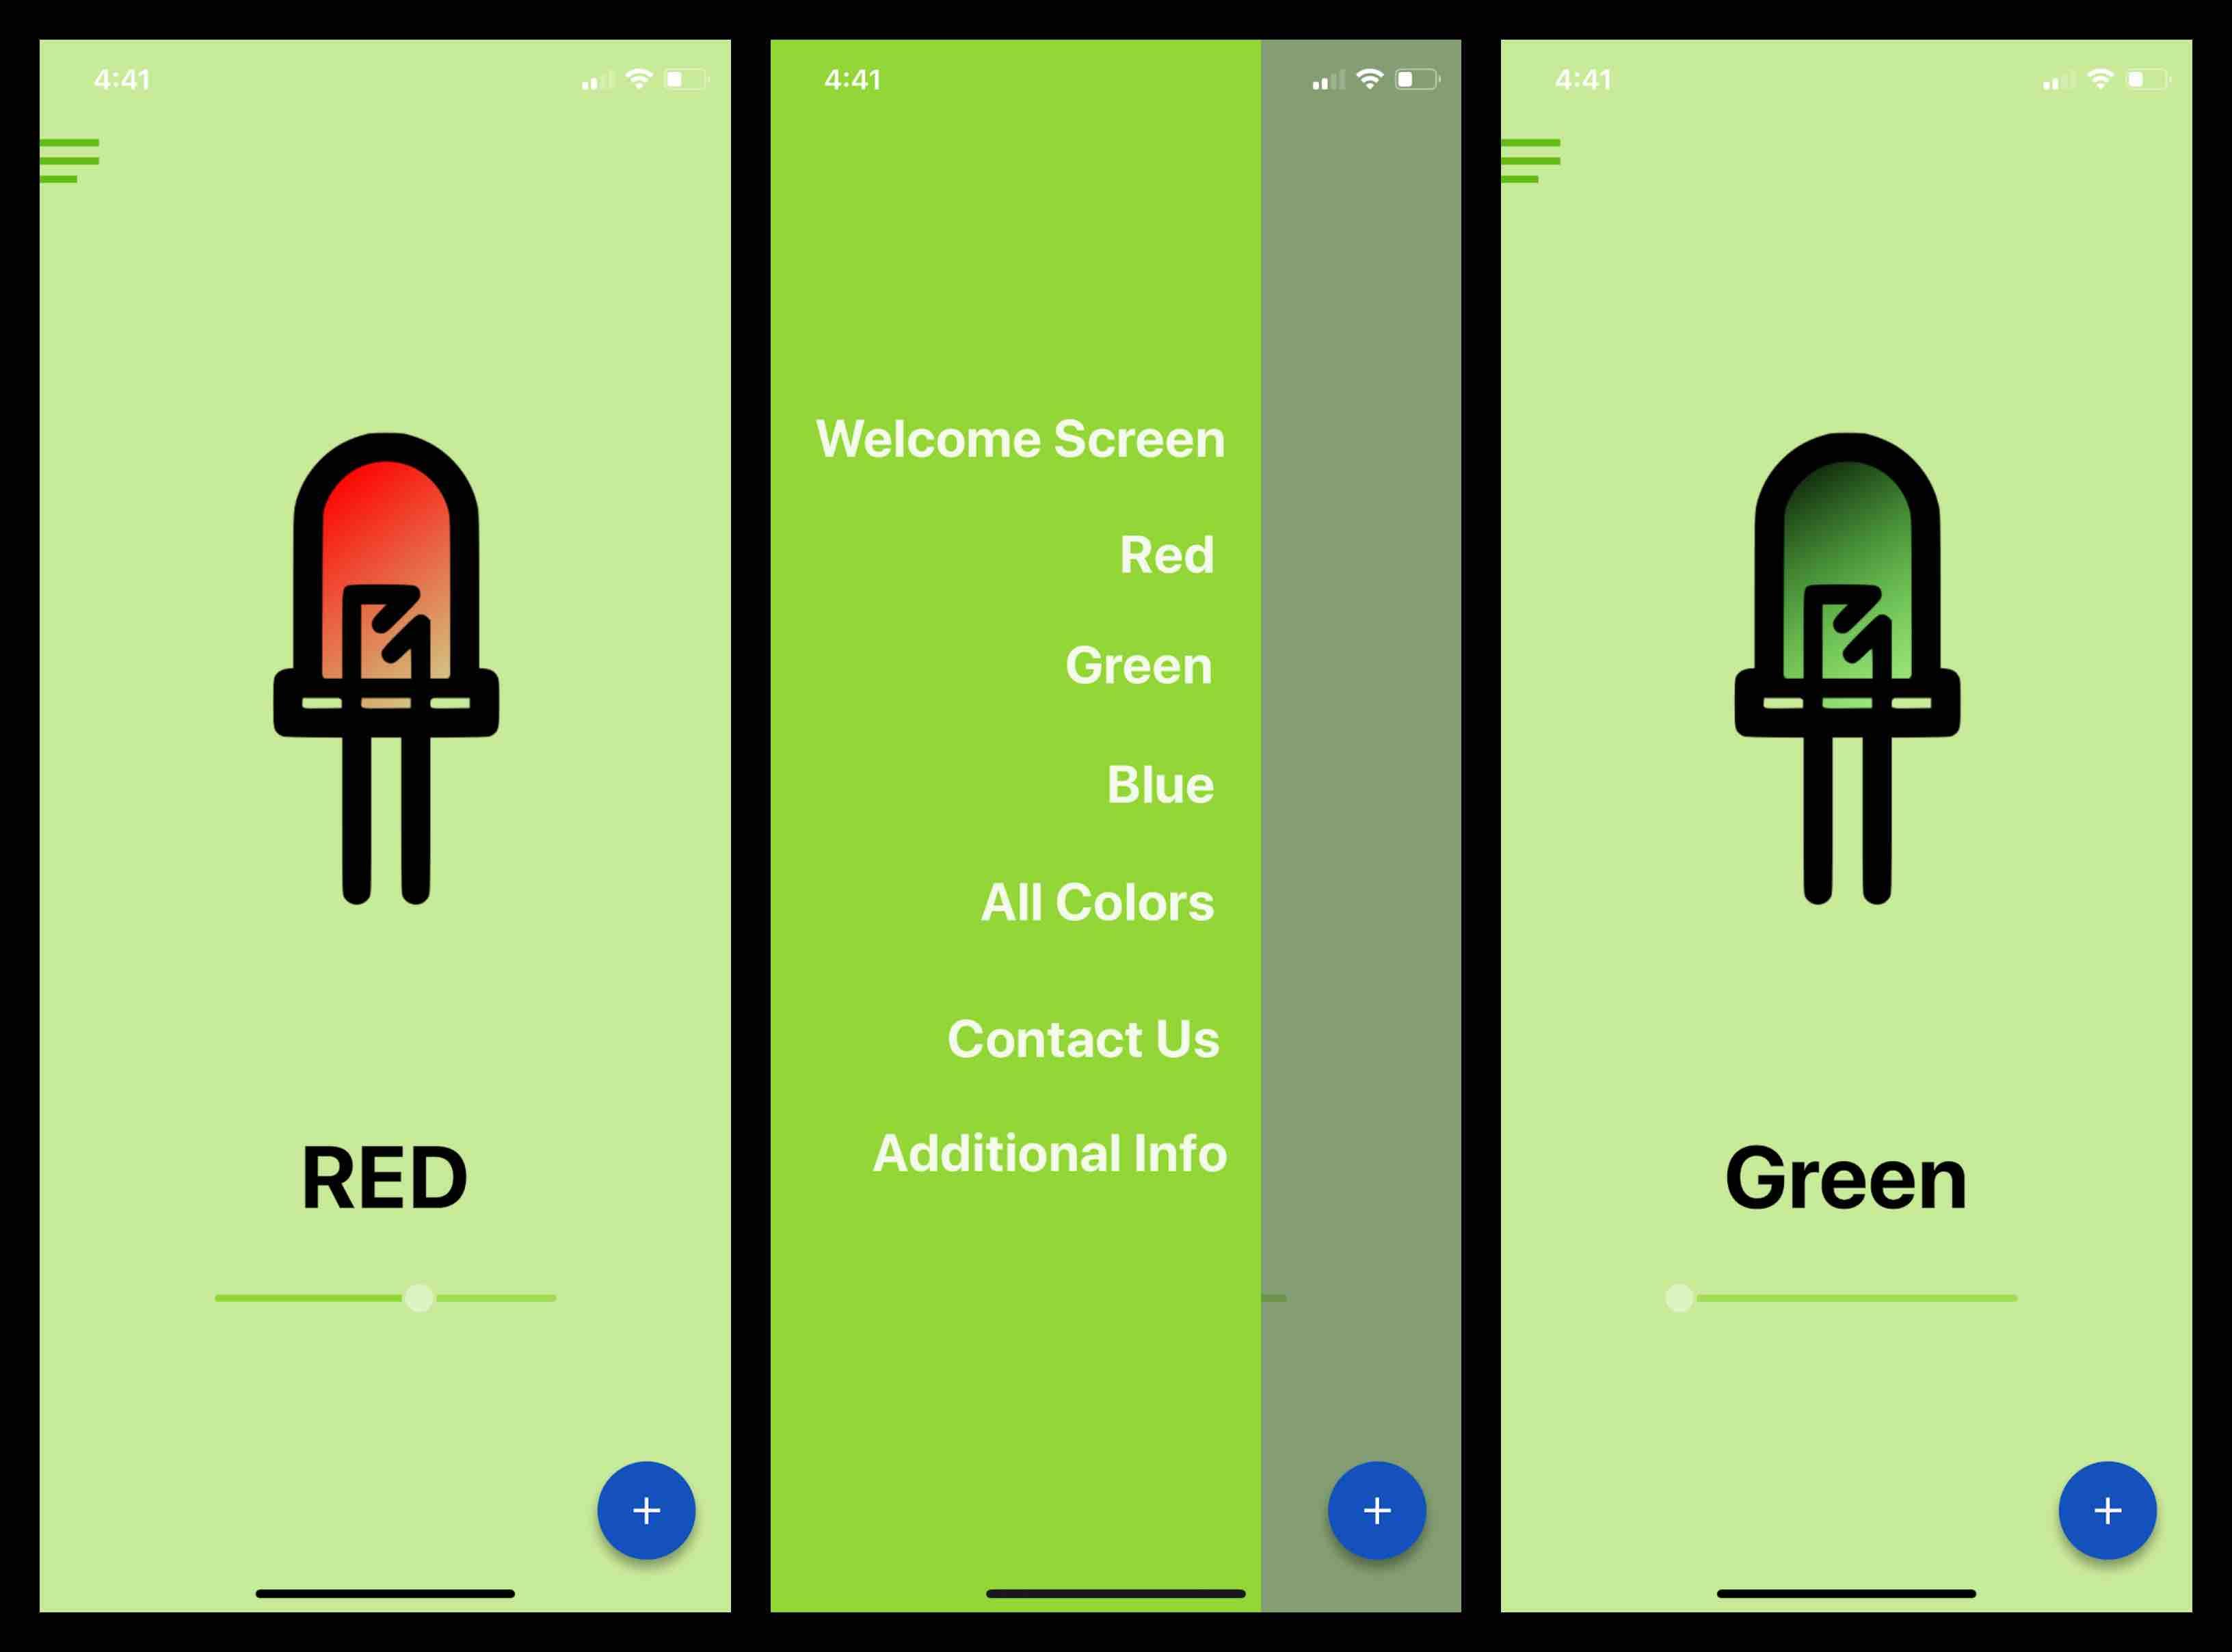 docs/images/week13/AppHivePhoneScreenChangeRedtoGreen.jpg